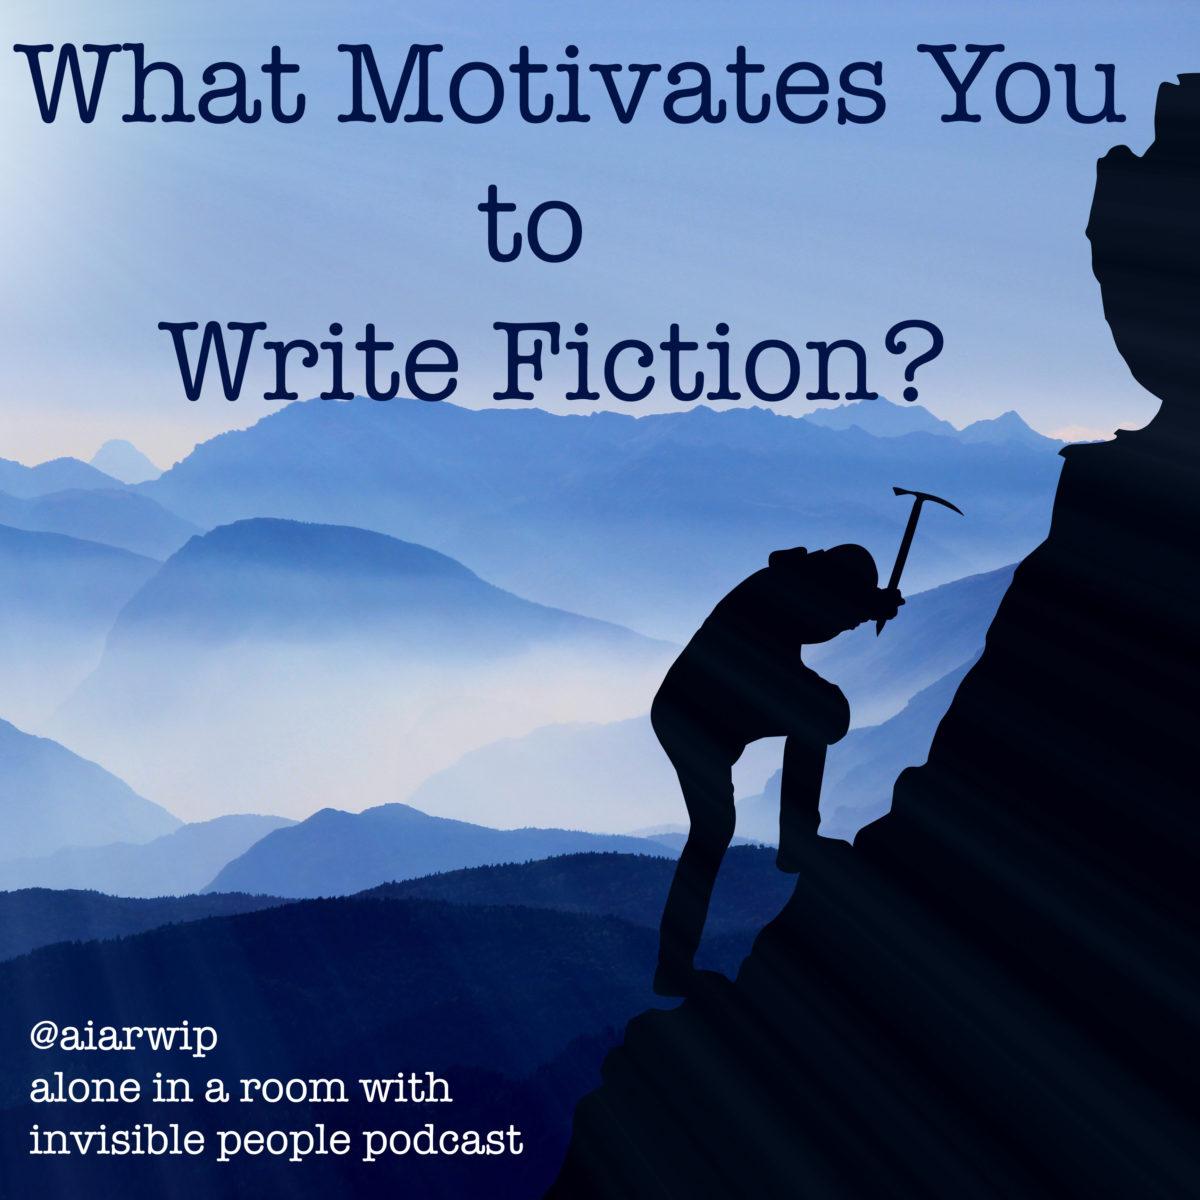 Episode 19: What Motivates You to Write Fiction